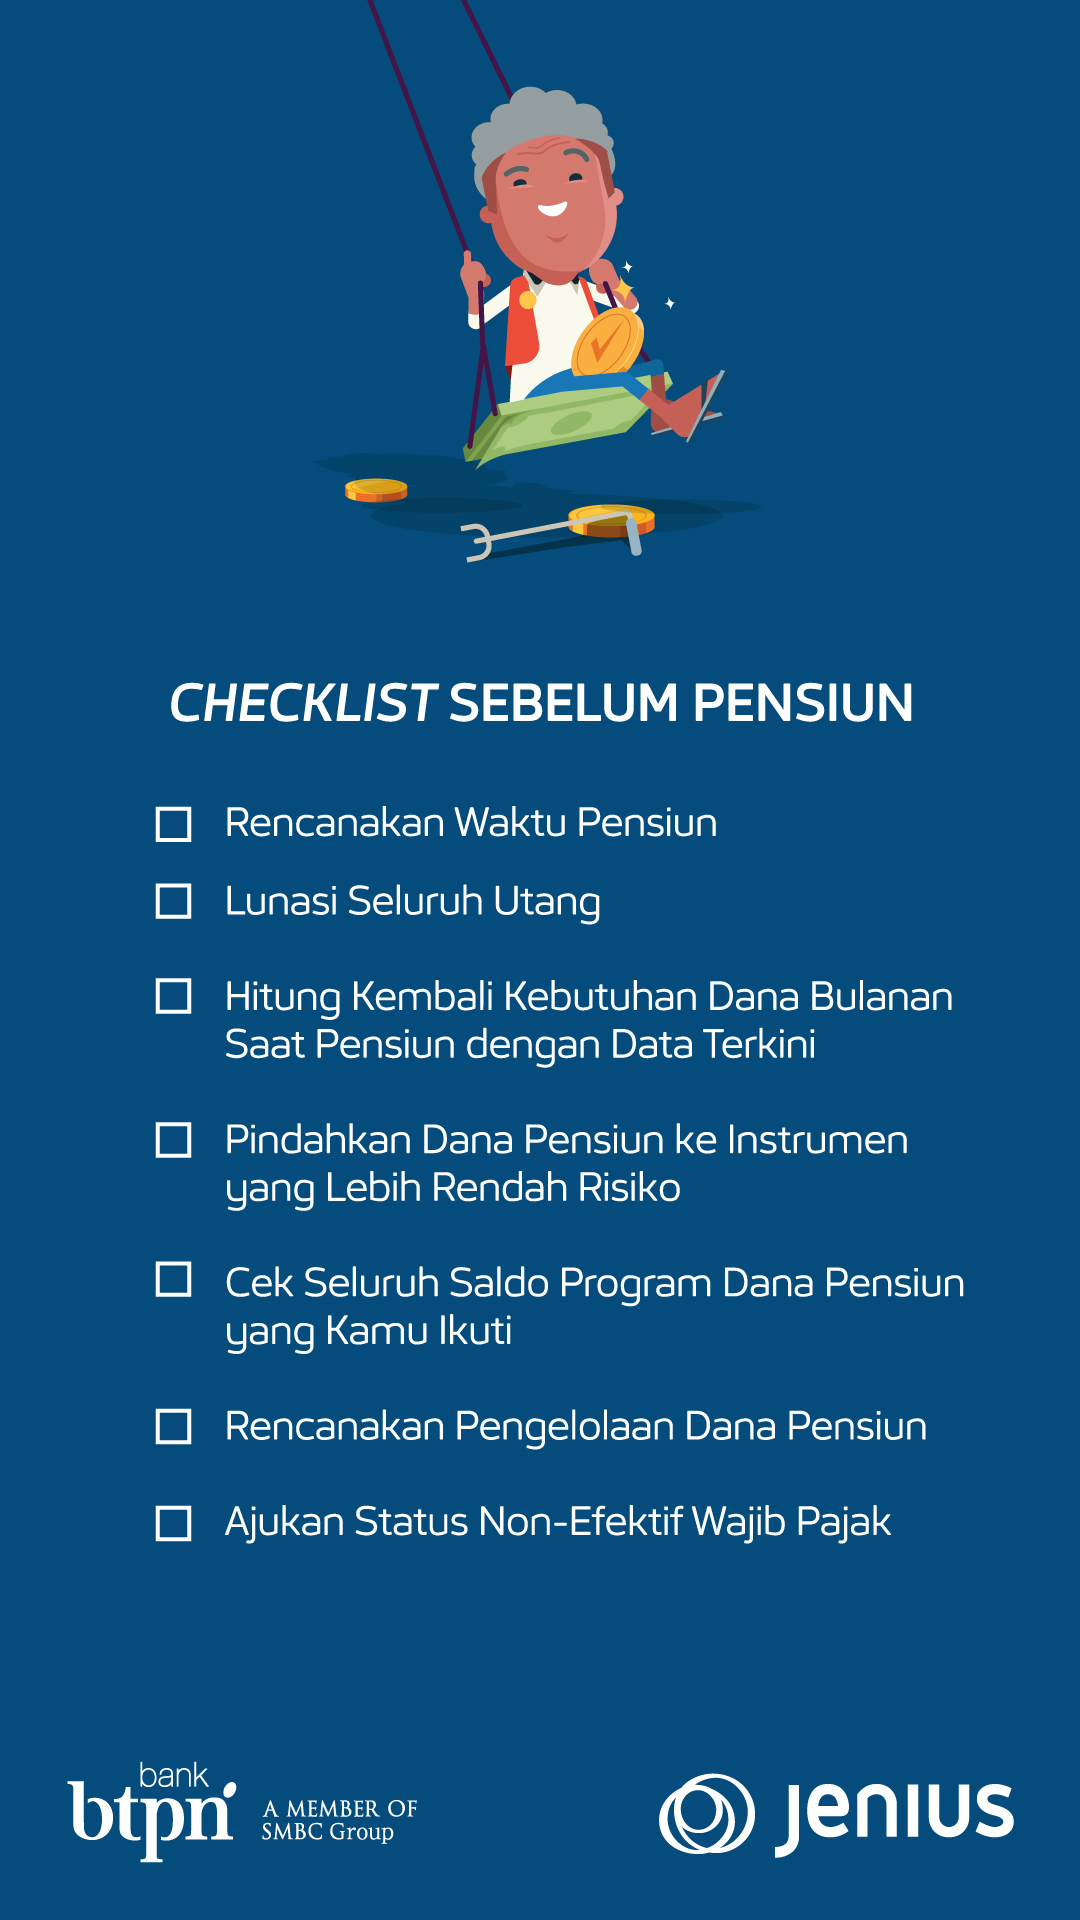 Financial Checklist 40 Tahunan